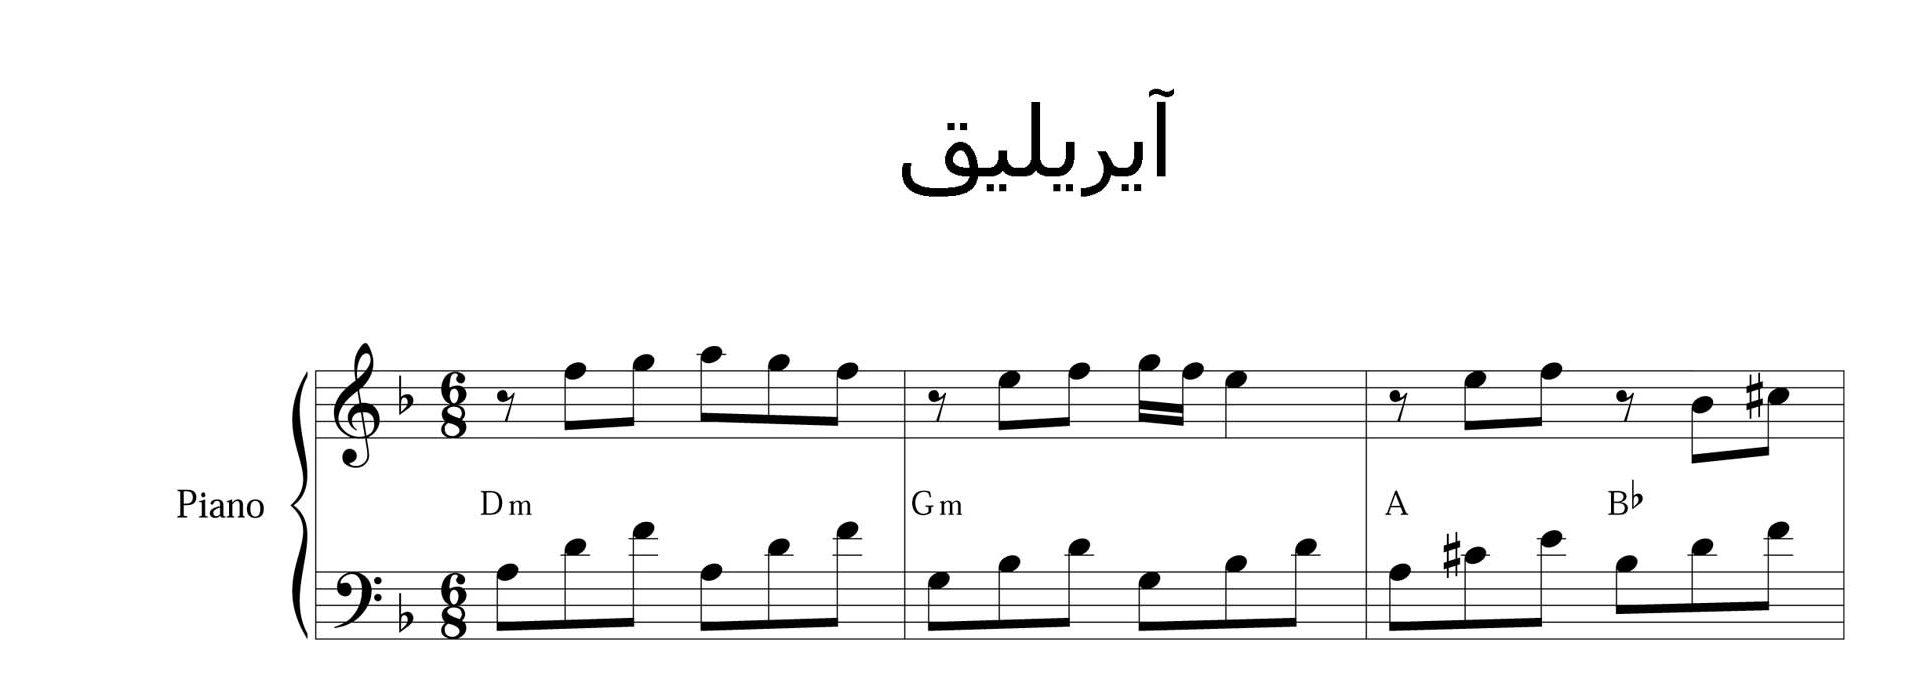 نت پیانوی آیریلیق تنظیم نیما اکبری